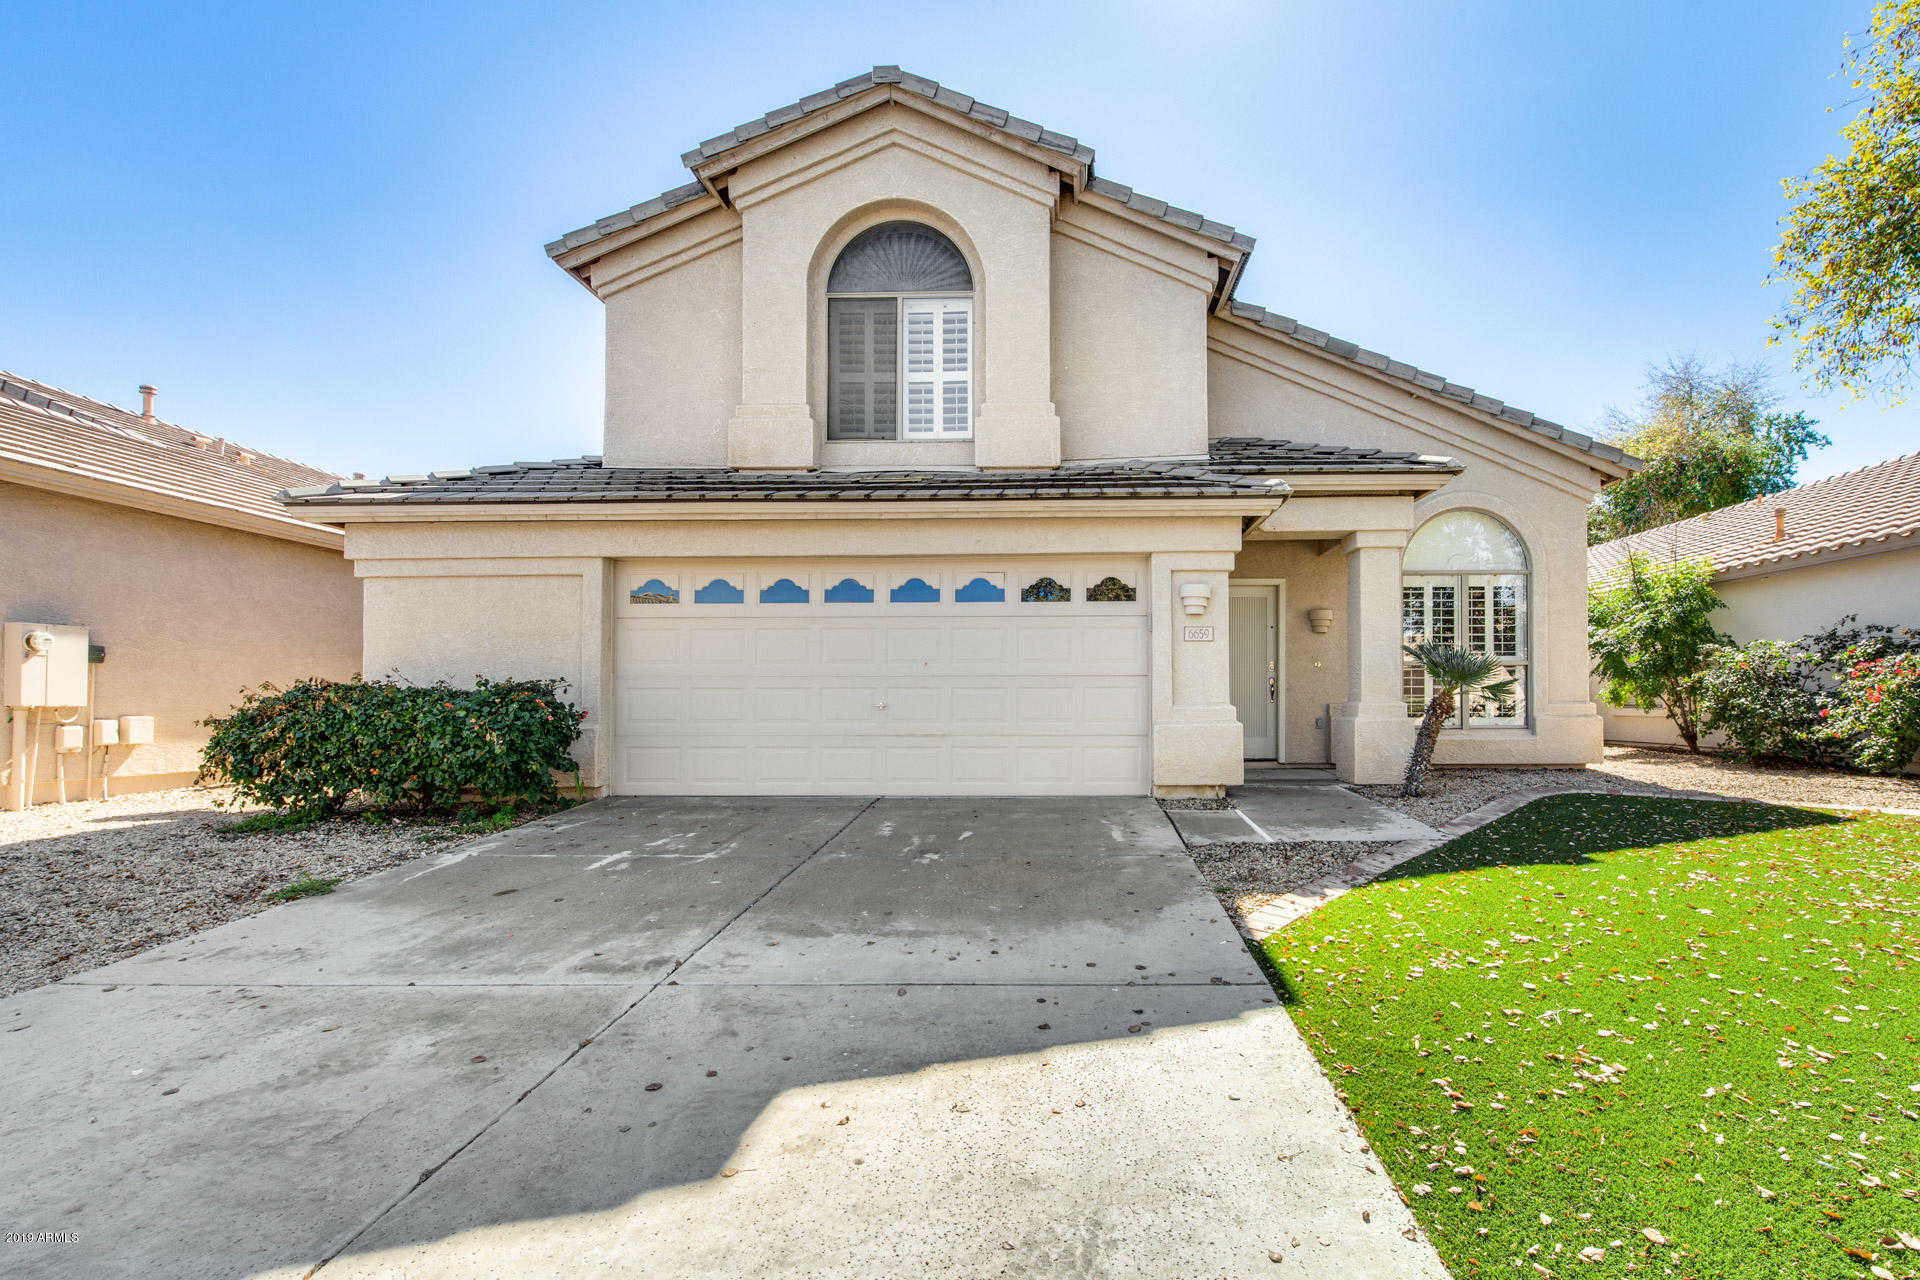 $338,900 - 3Br/3Ba - Home for Sale in Arrowhead Ranch Parcel 10, Glendale